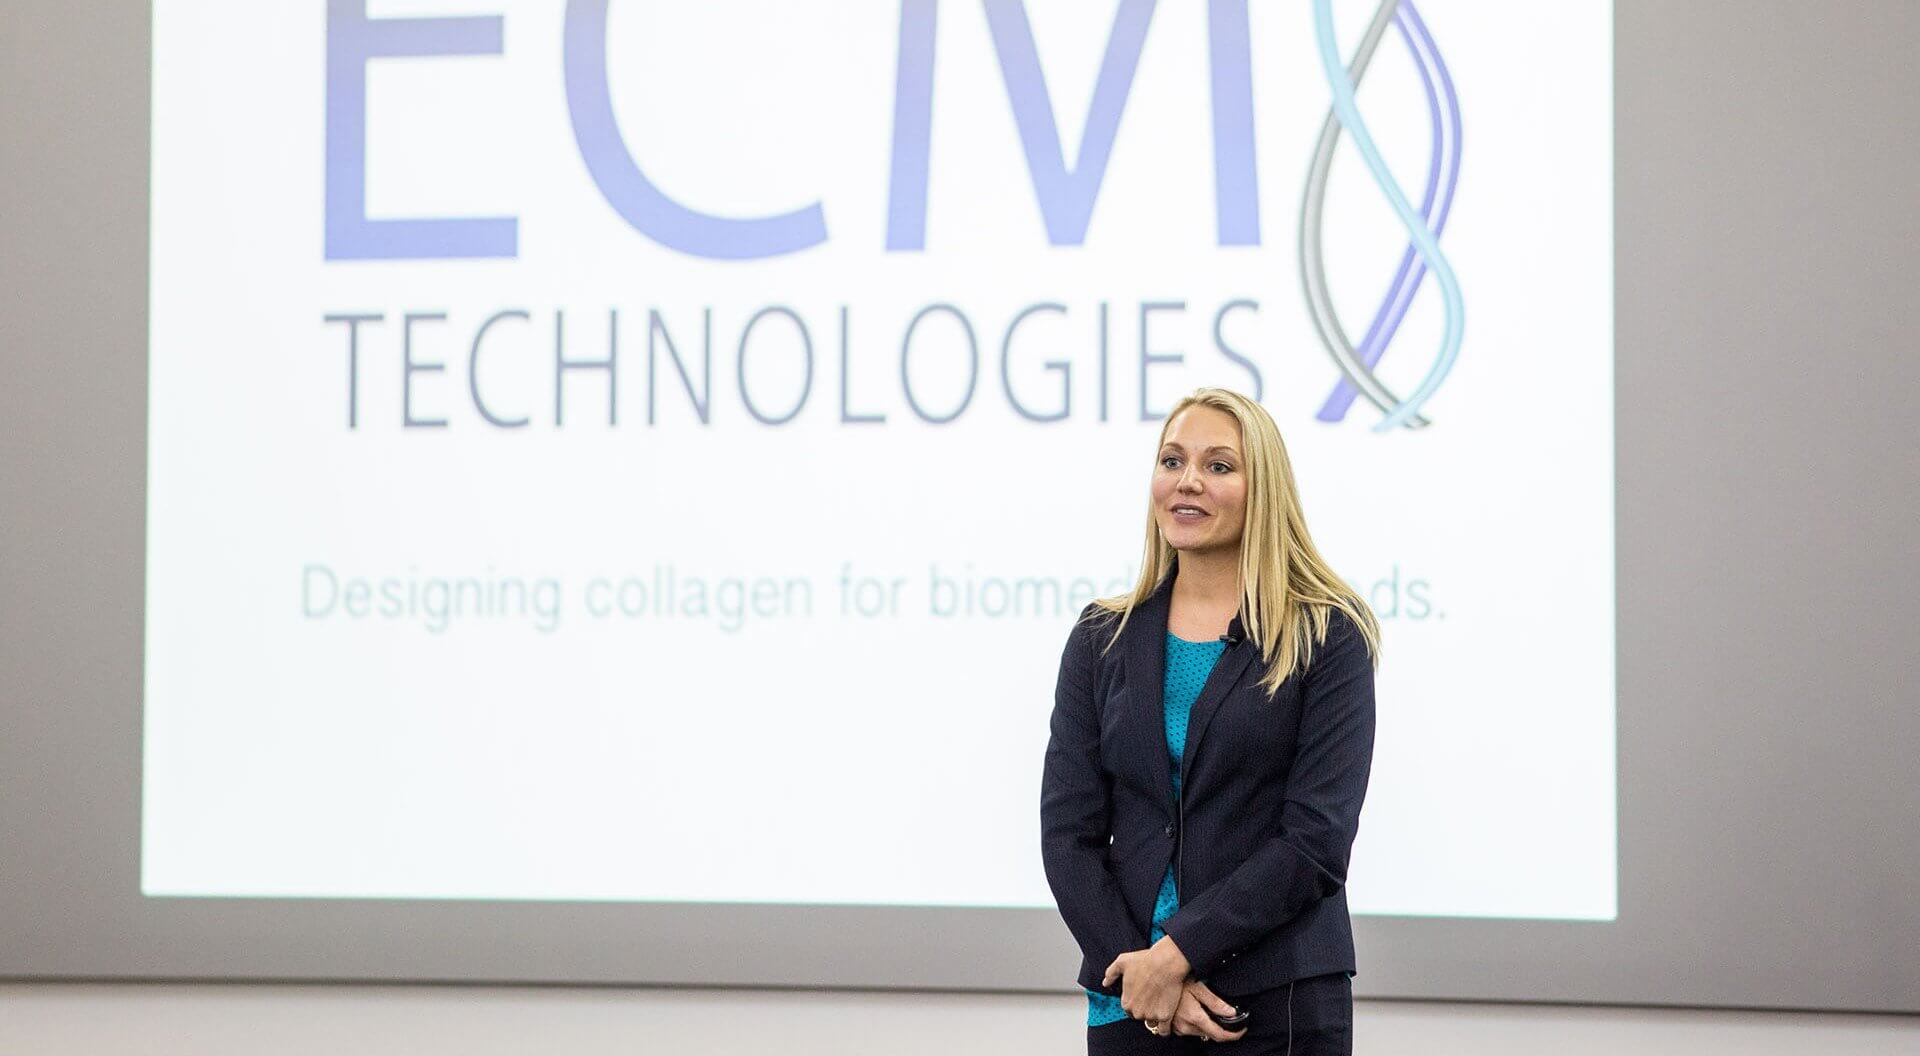 Brooke Russell, Ph.D., vice president of ECM Technologies.